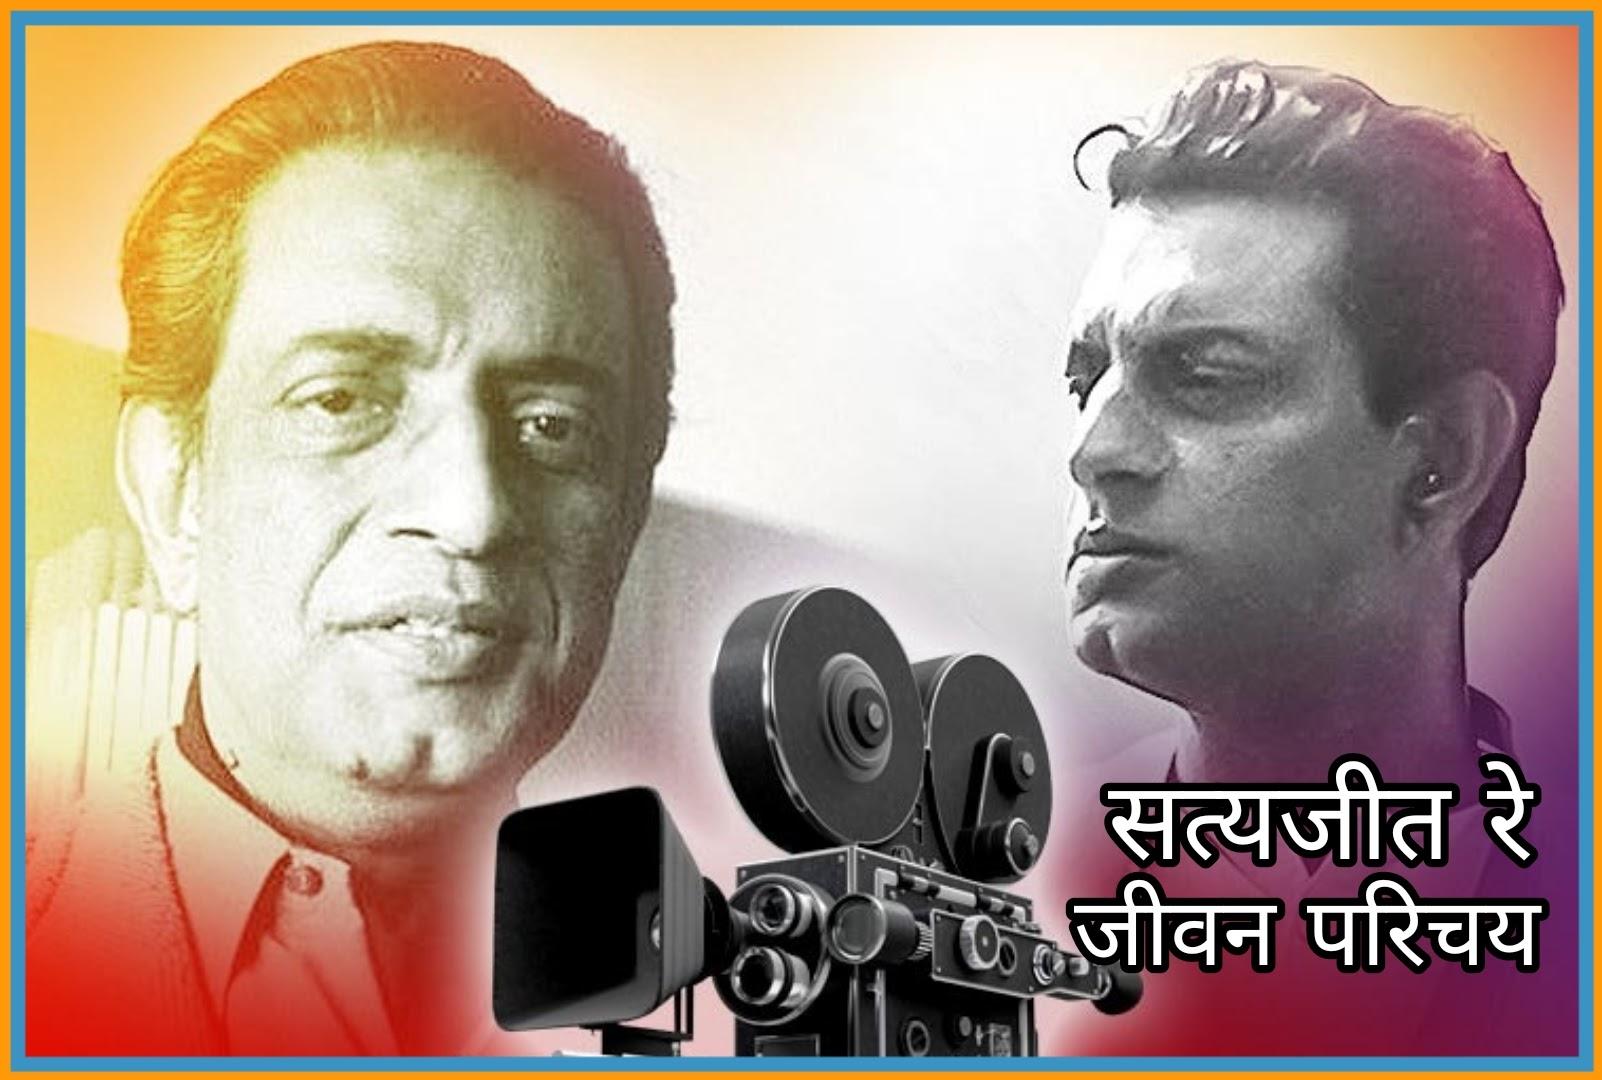 सत्यजीत रे जीवनी, सत्यजीत रे का जीवन परिचय, ए. पी. जे. अब्दुल कलाम बायोग्राफी, Satyajit Ray Biography in Hindi, Satyajit Ray ki jivani, Satyajit Ray ka jeevan parichay, Essay on Satyajit Ray in Hindi, Biography of Satyajit Ray in Hindi